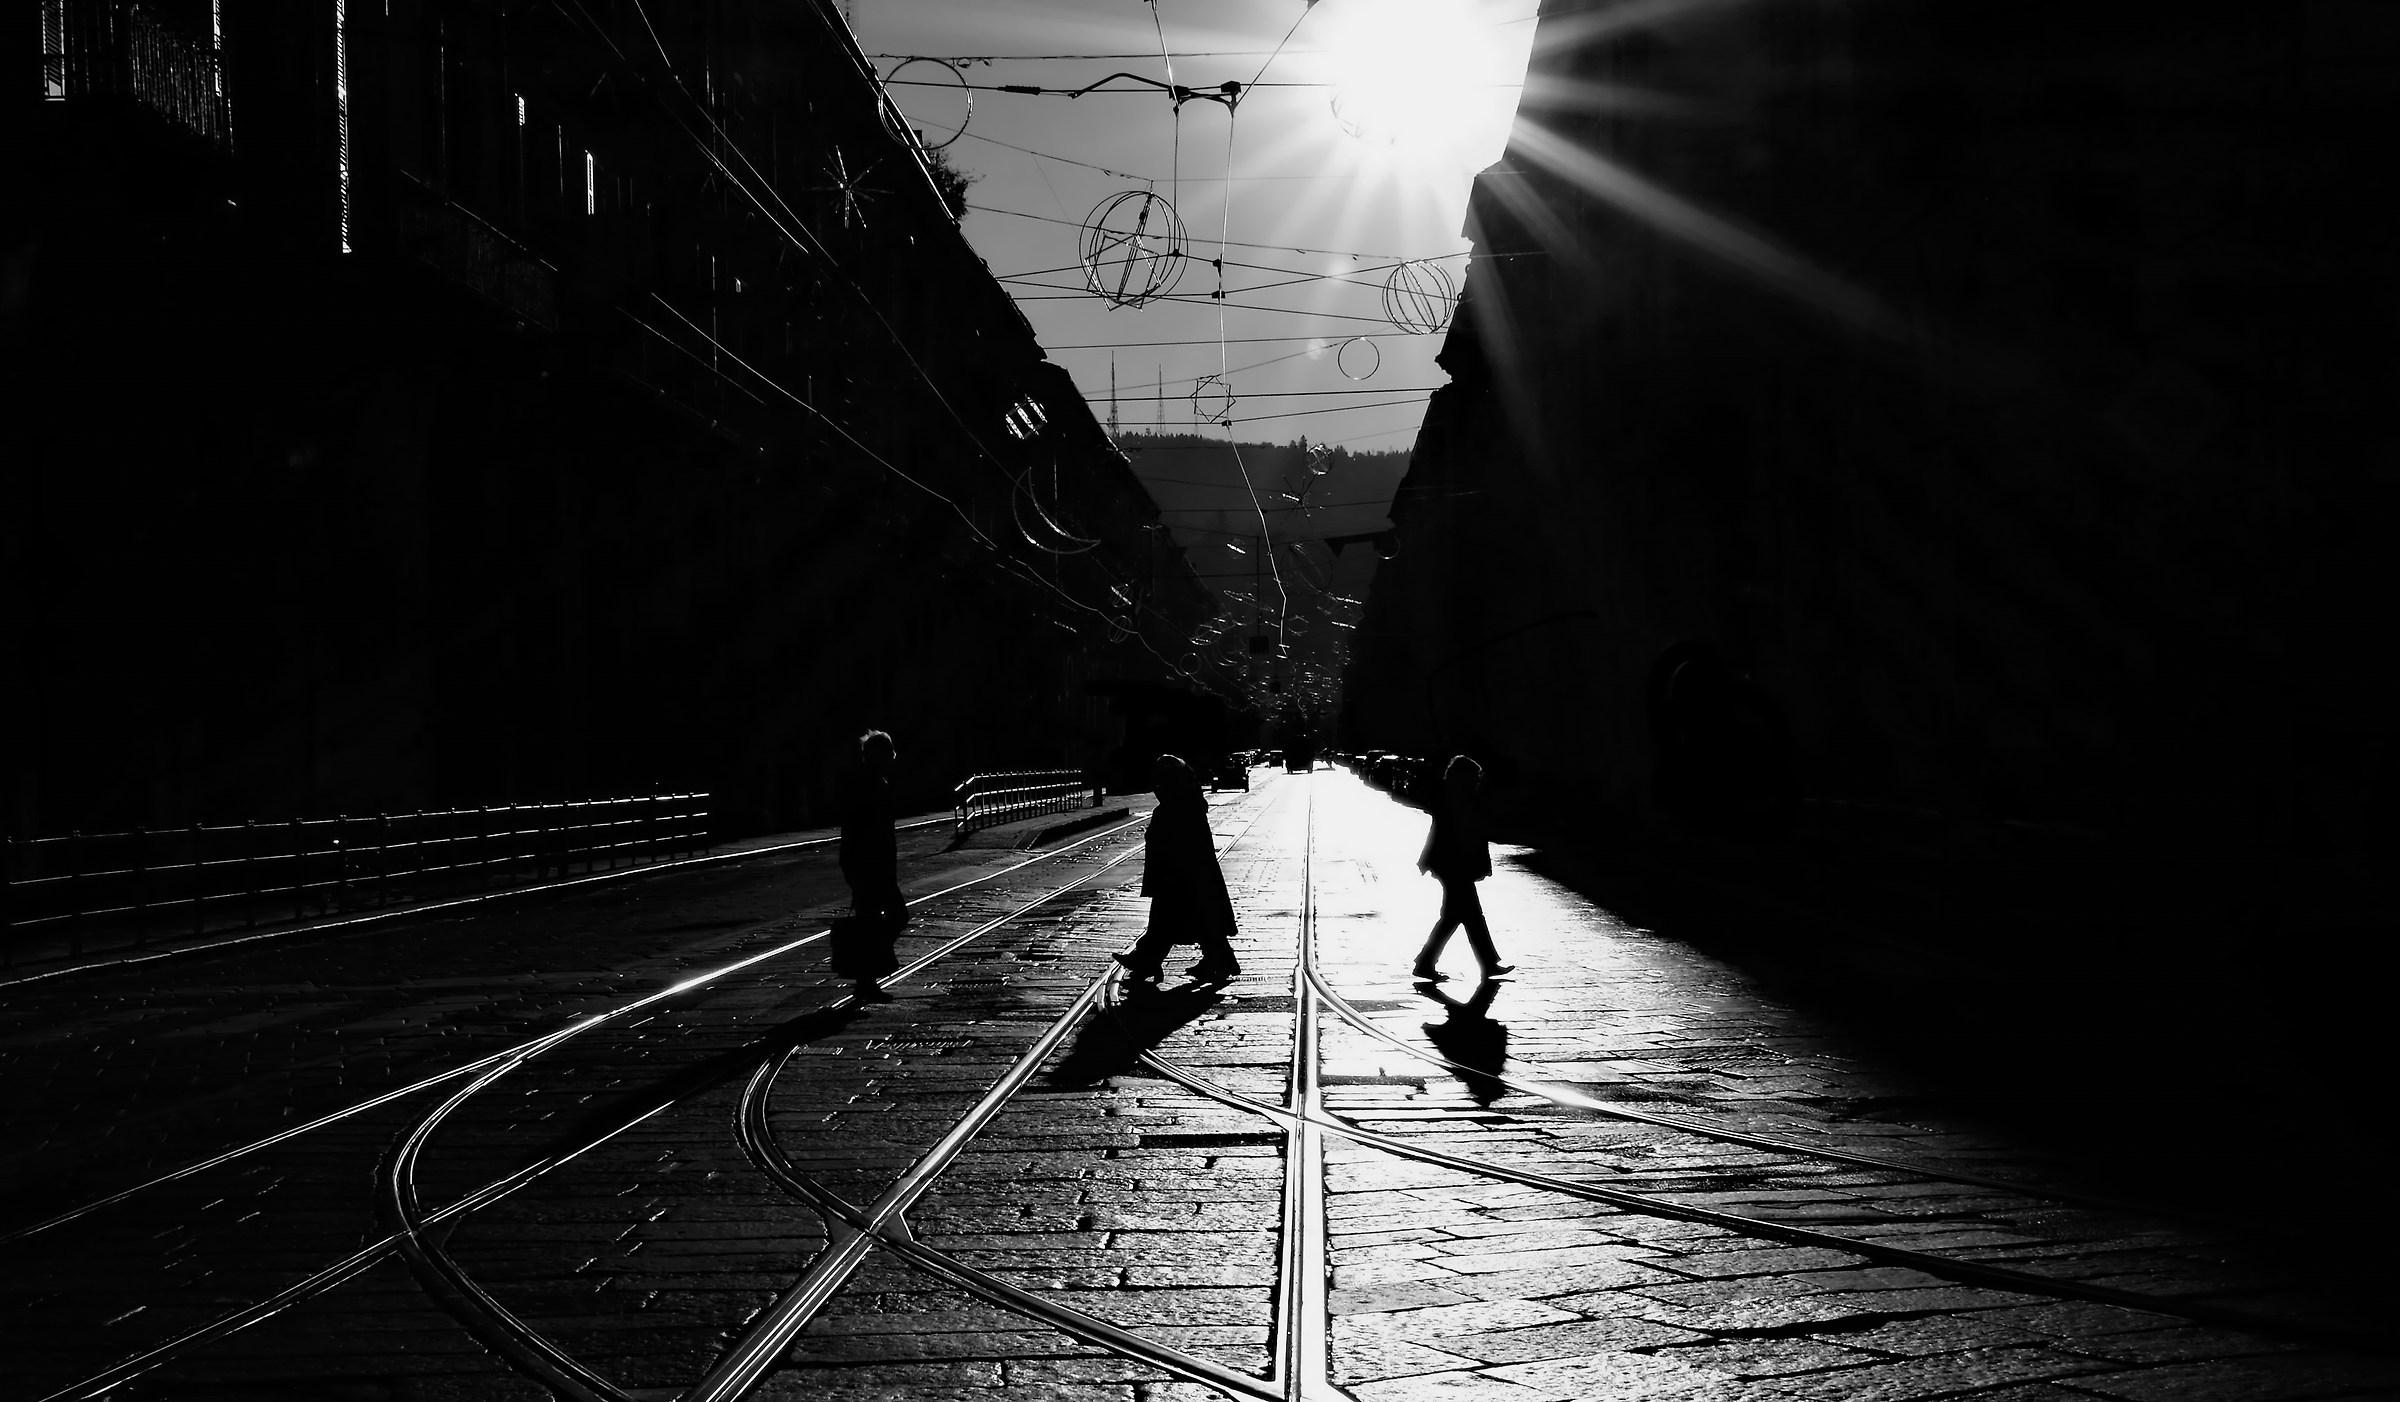 the four pedestrians...